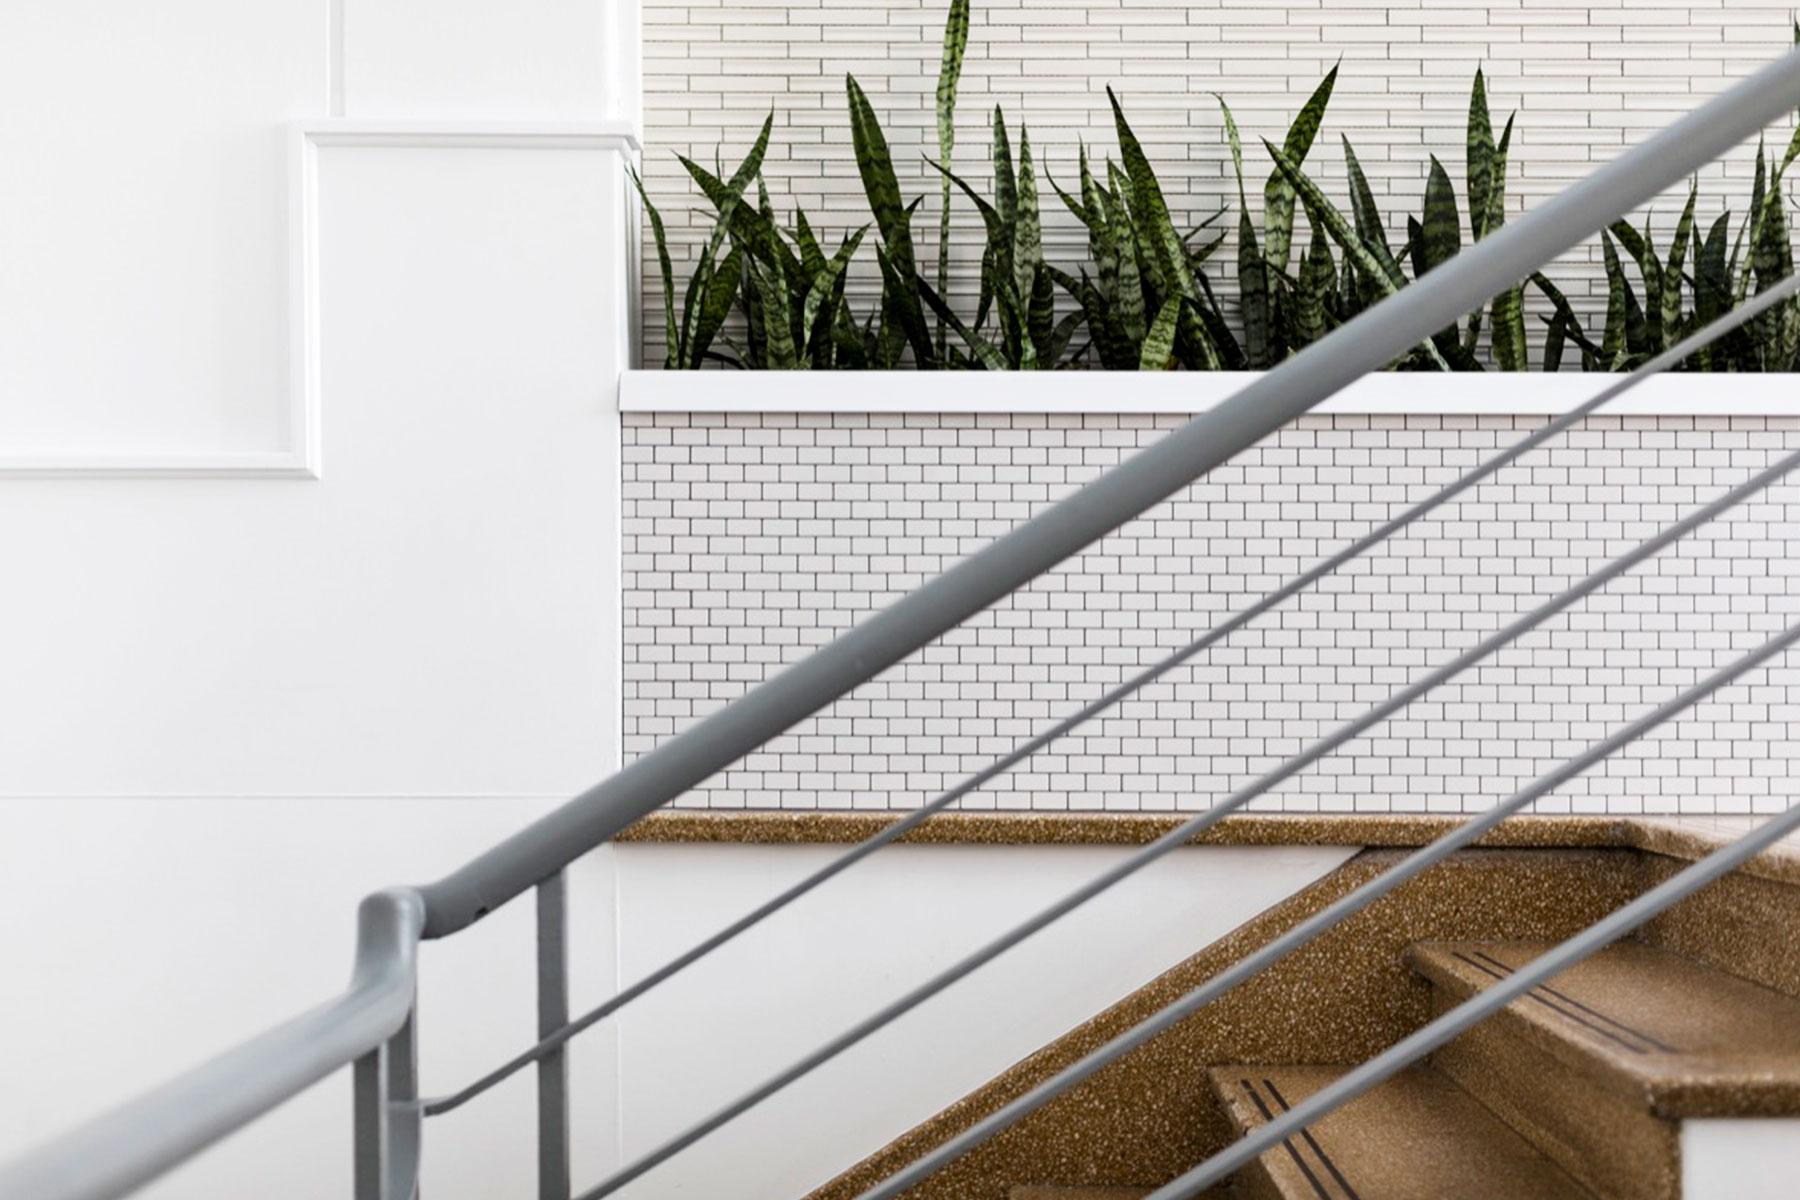 ©-Adam-Robinson-Design-Accent-Plants-06.jpg